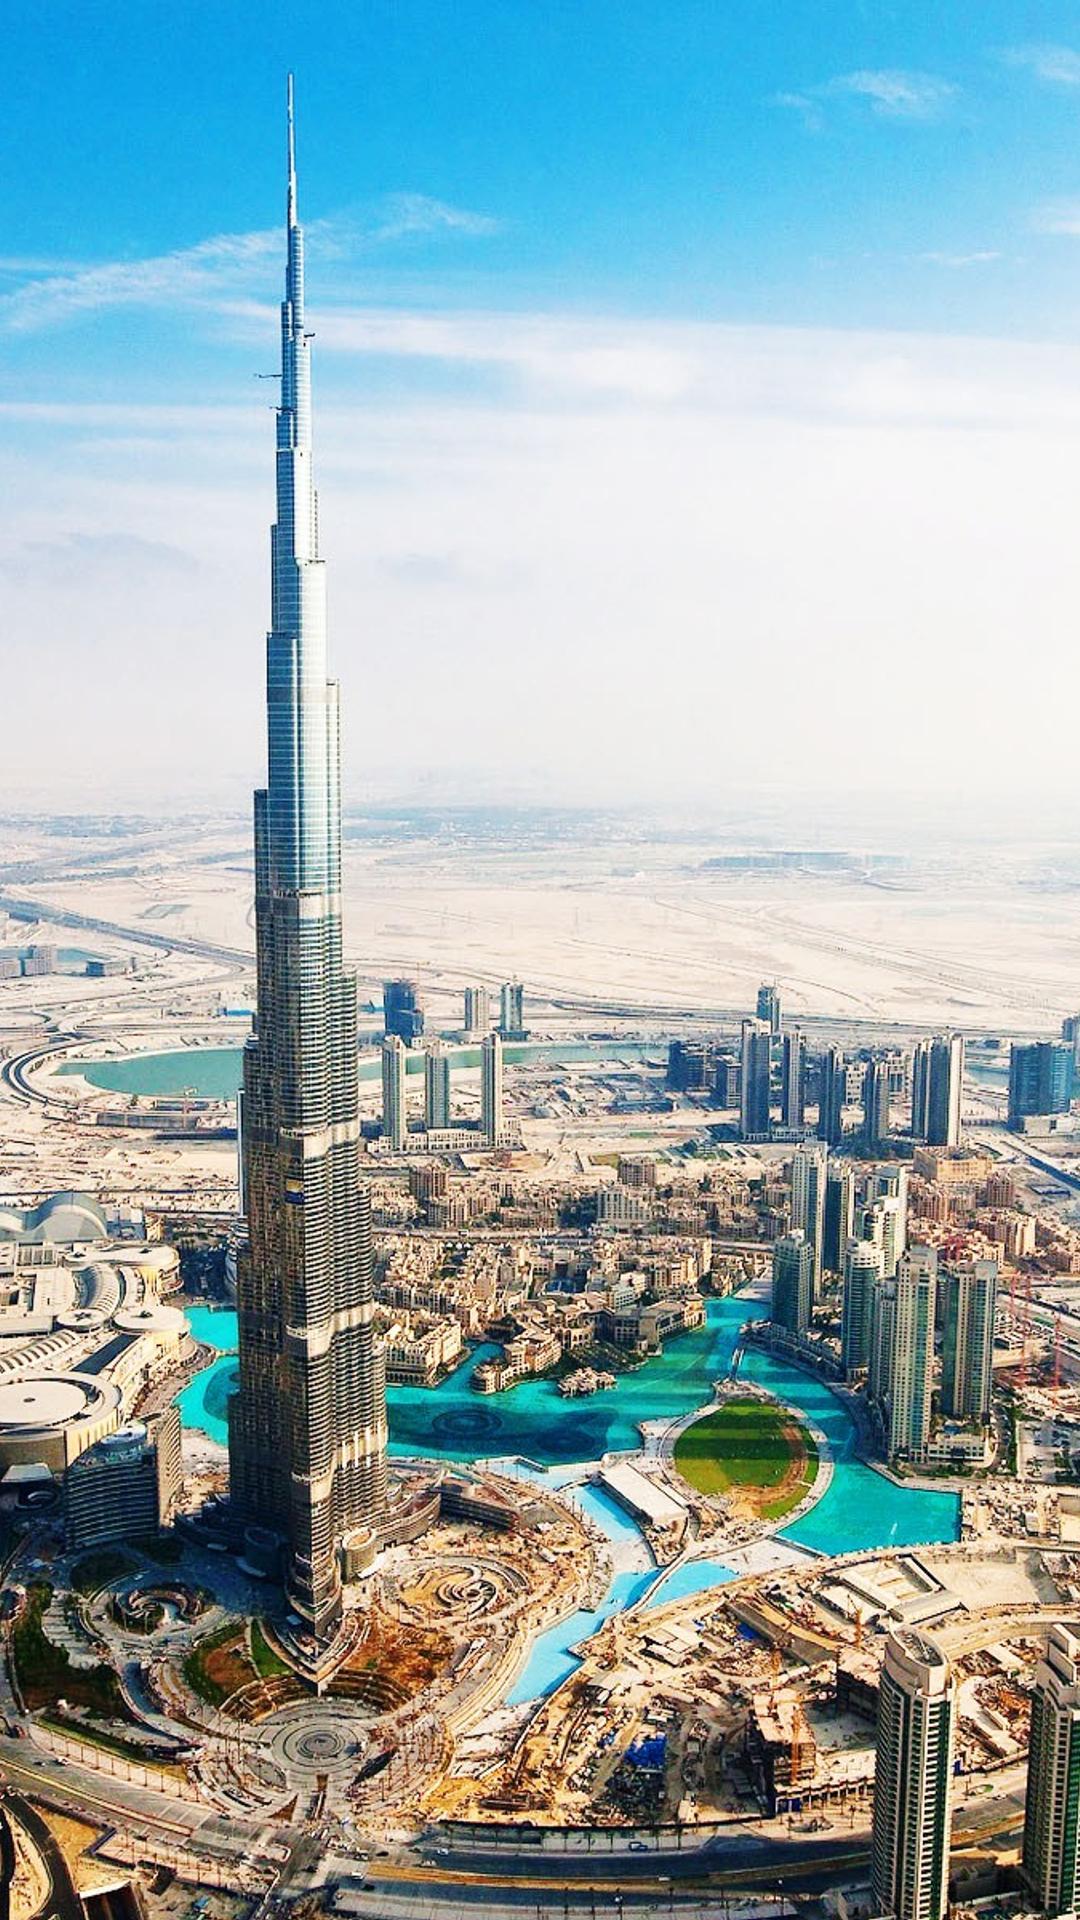 Wonderful Architecture At Burj Khalifa City From Dubai